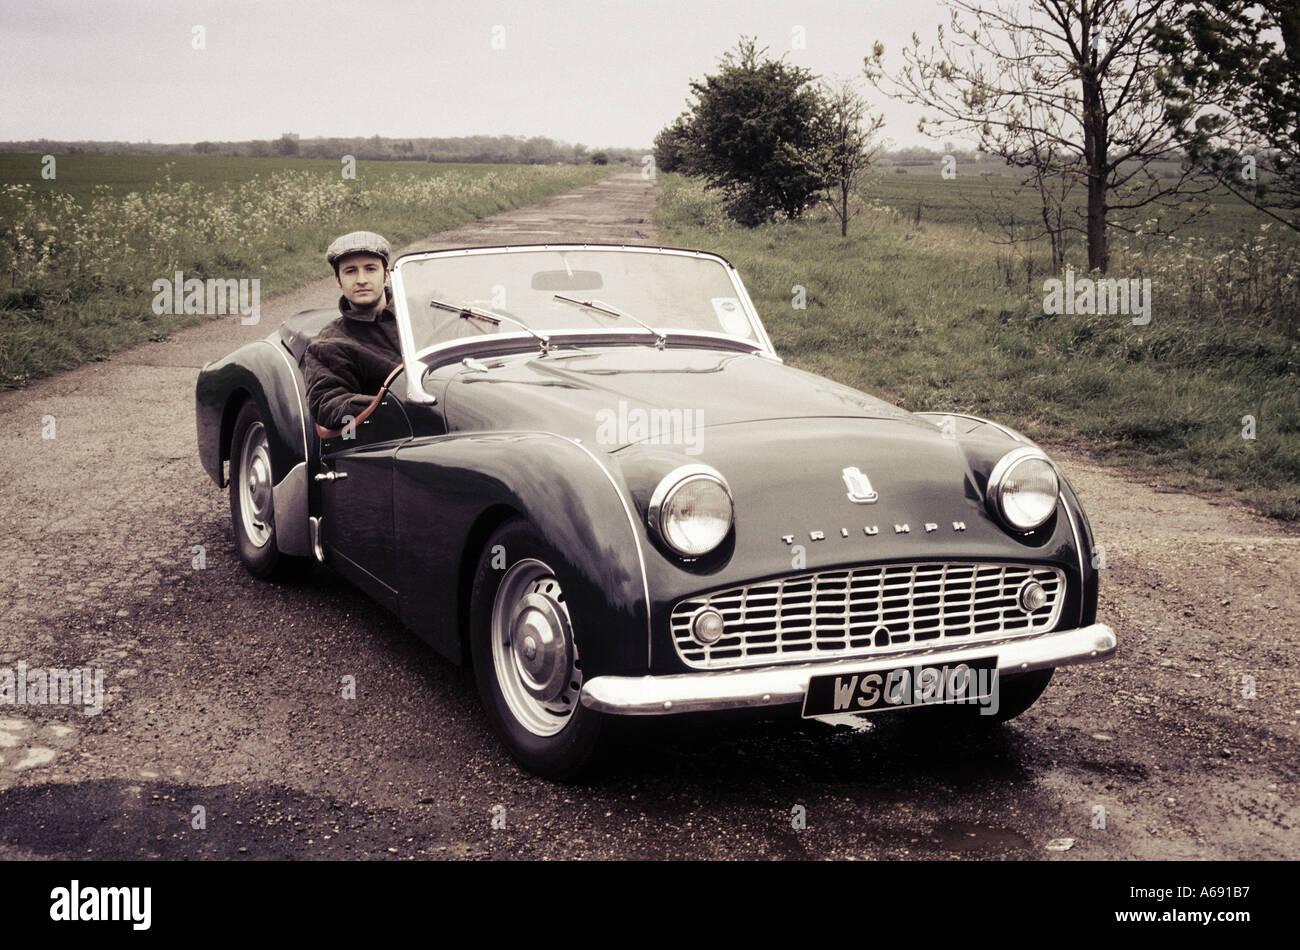 posh bloke with car 4 - Stock Image